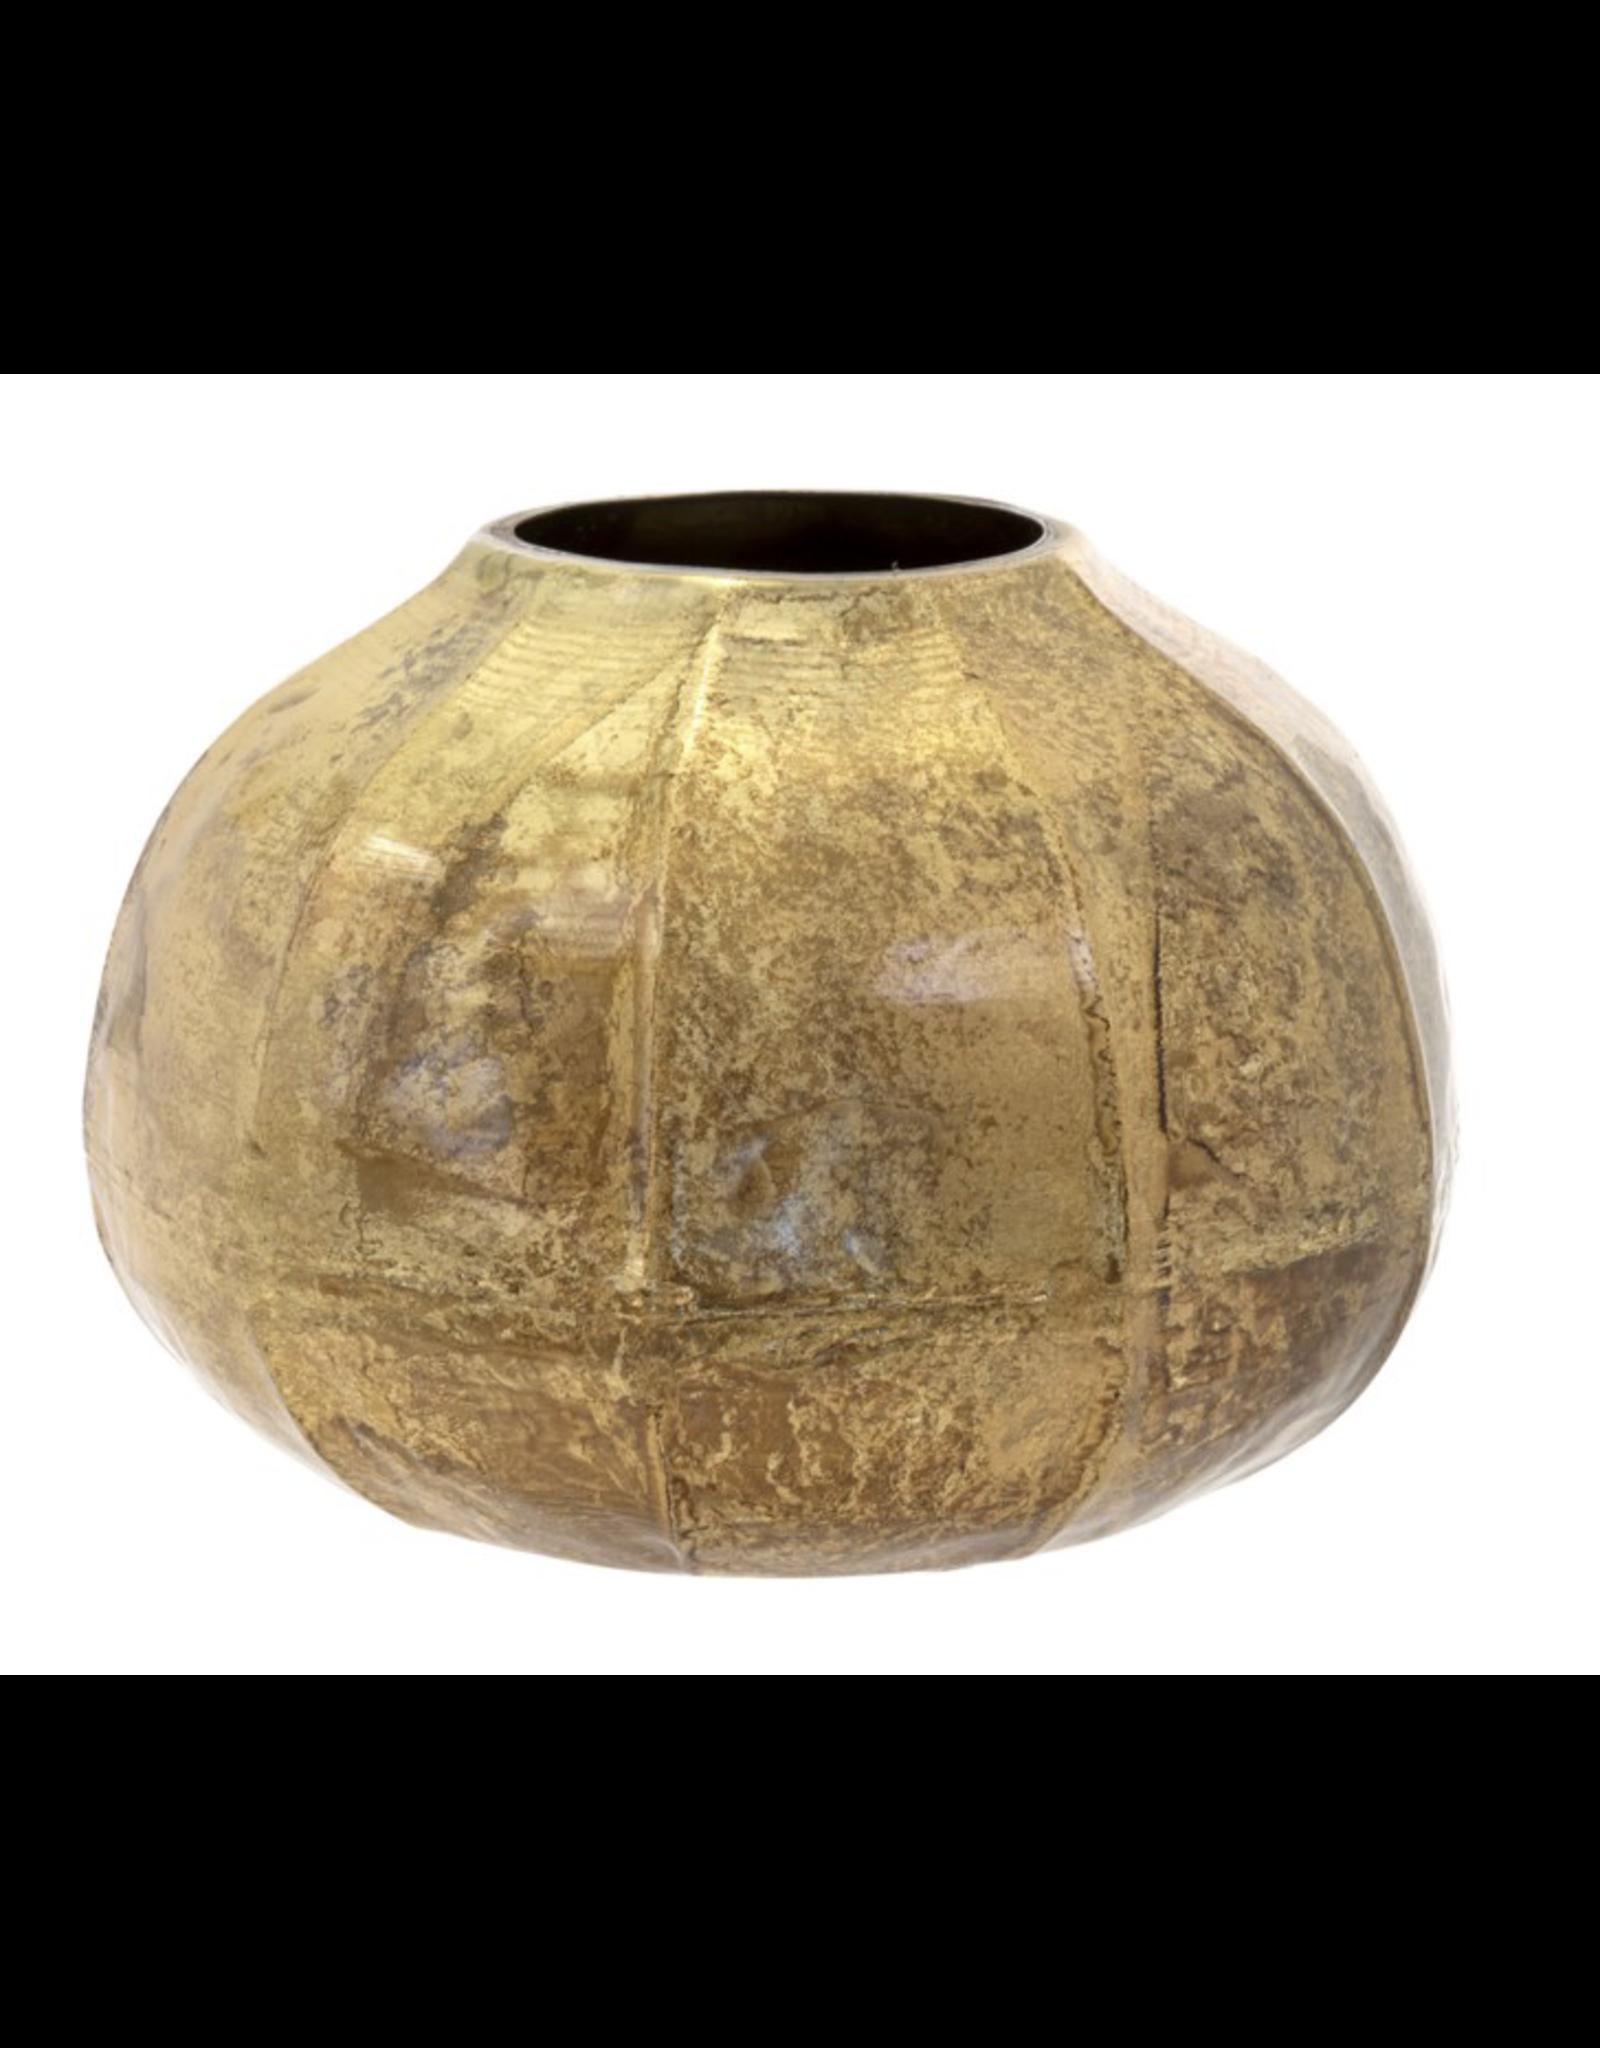 Cobblestone Round Vase - Gold Crackle Lg